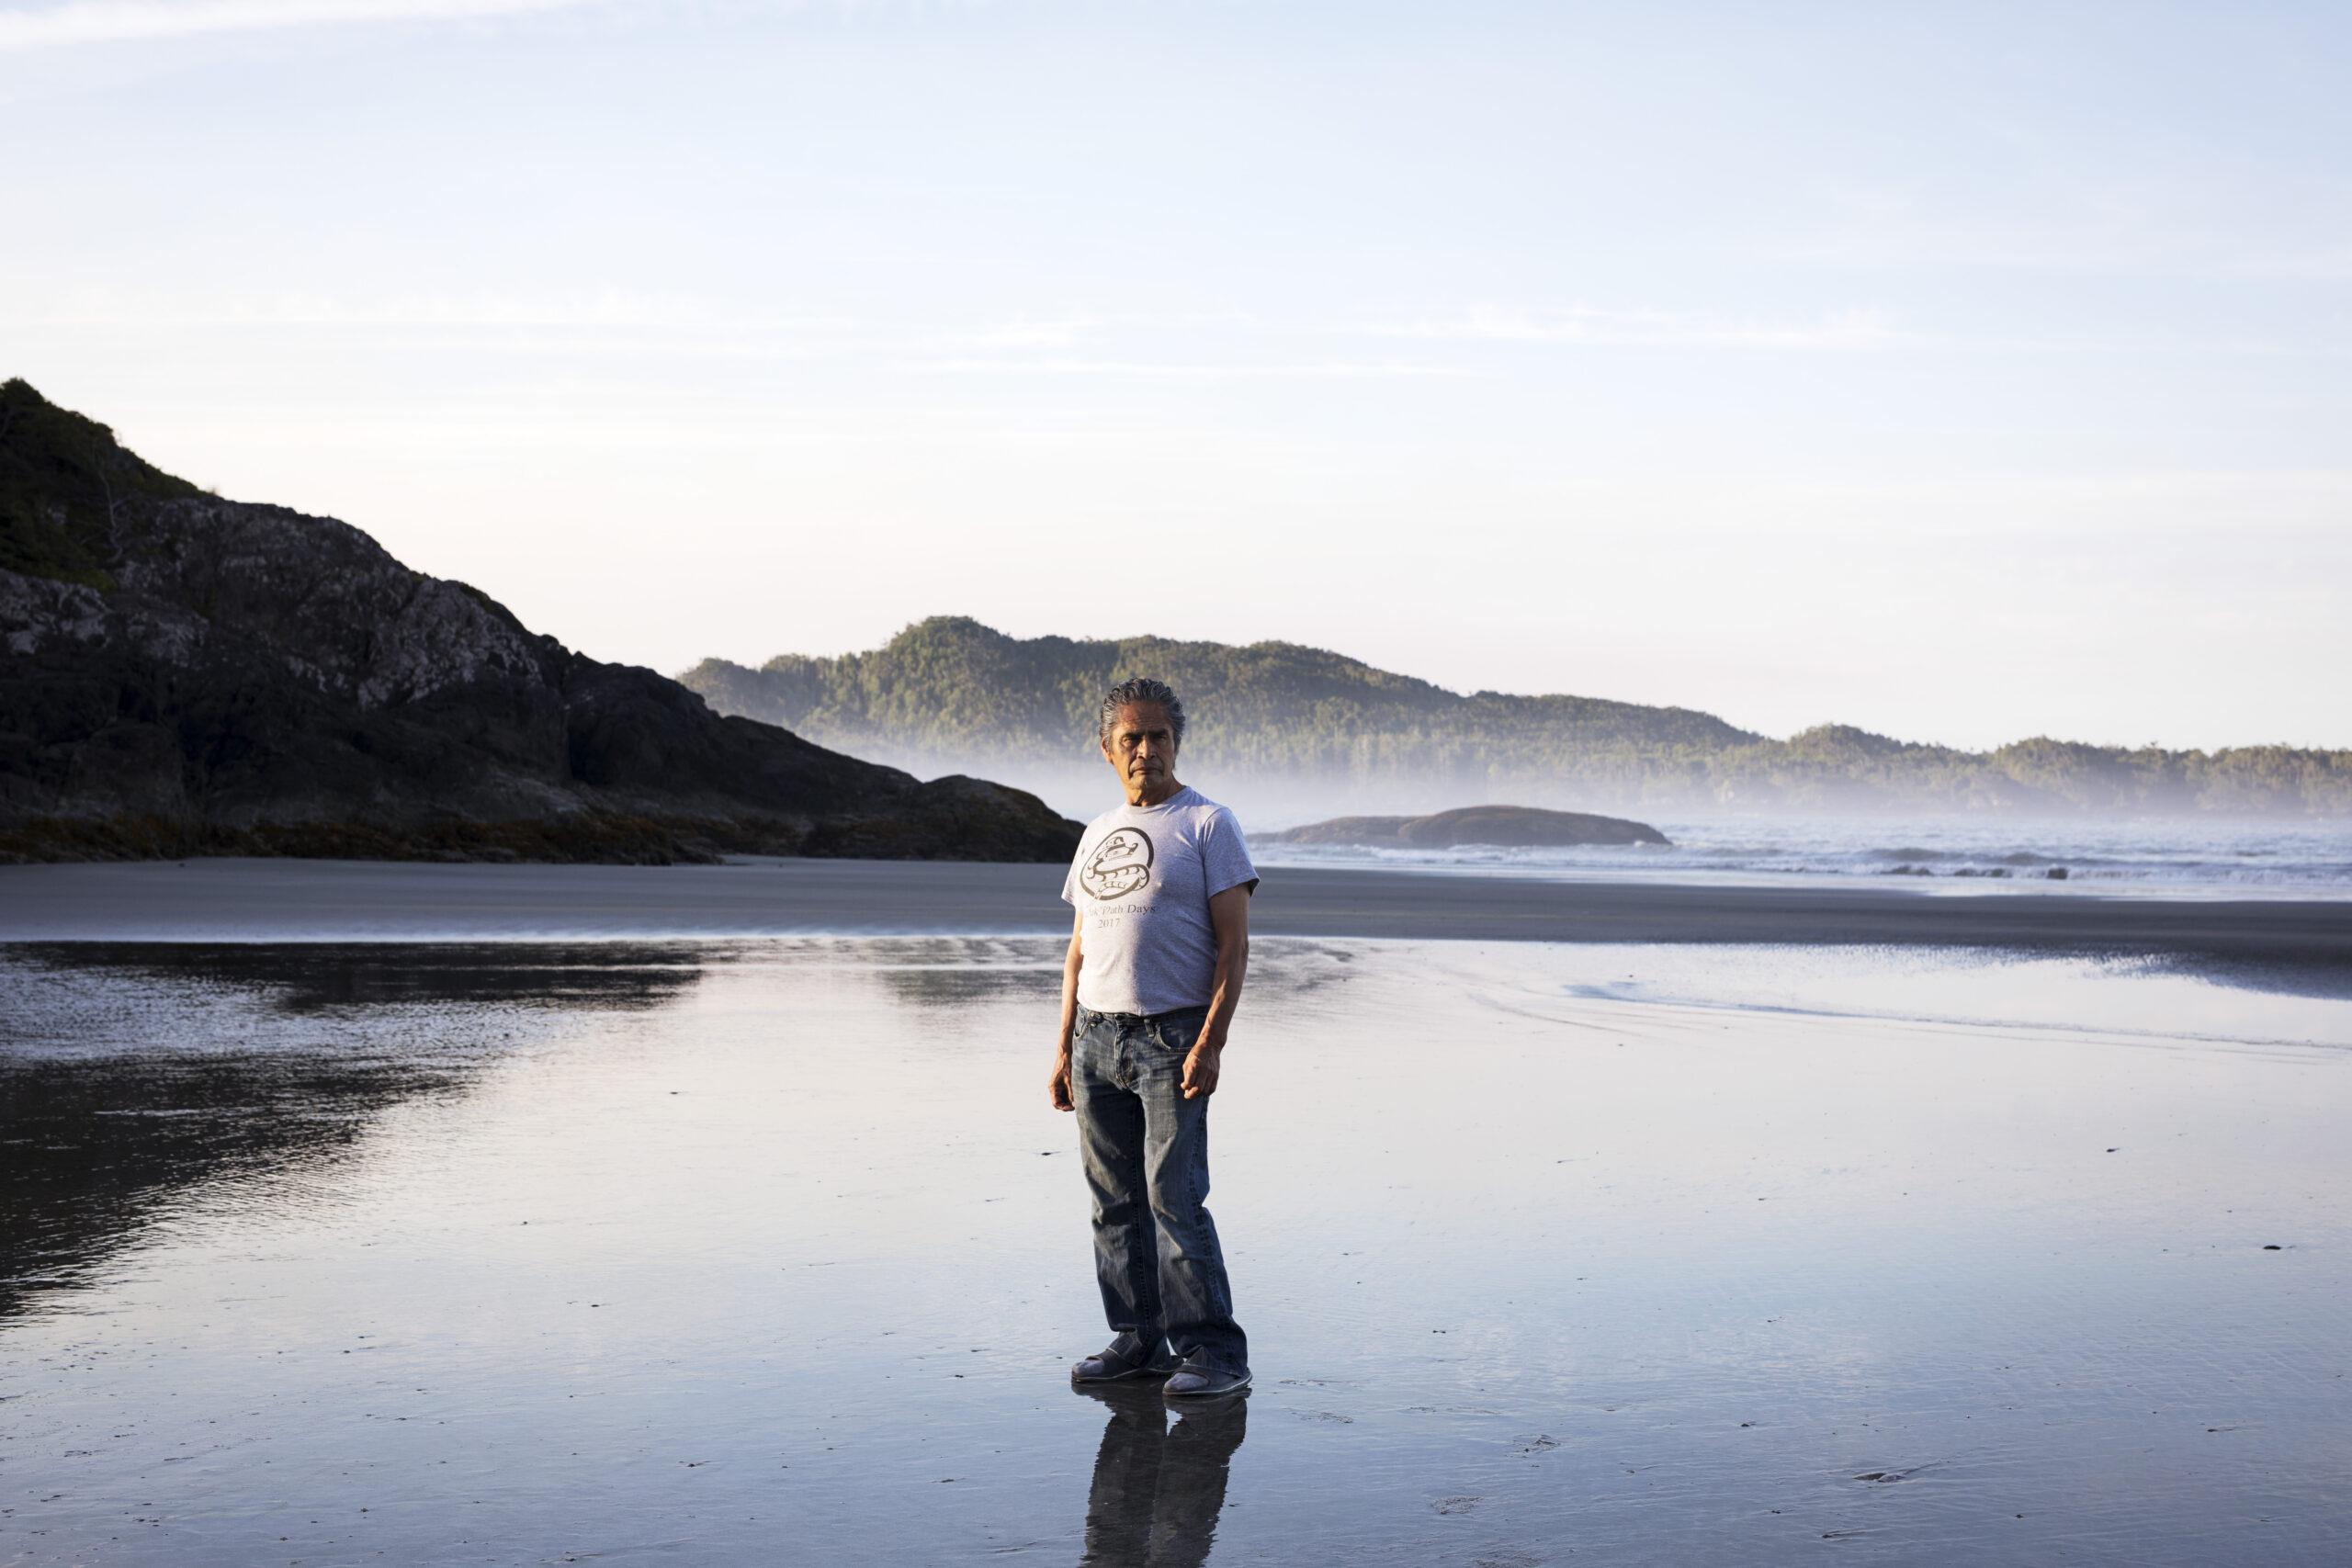 Joe Martin poses for a portrait on Chesterman Beach